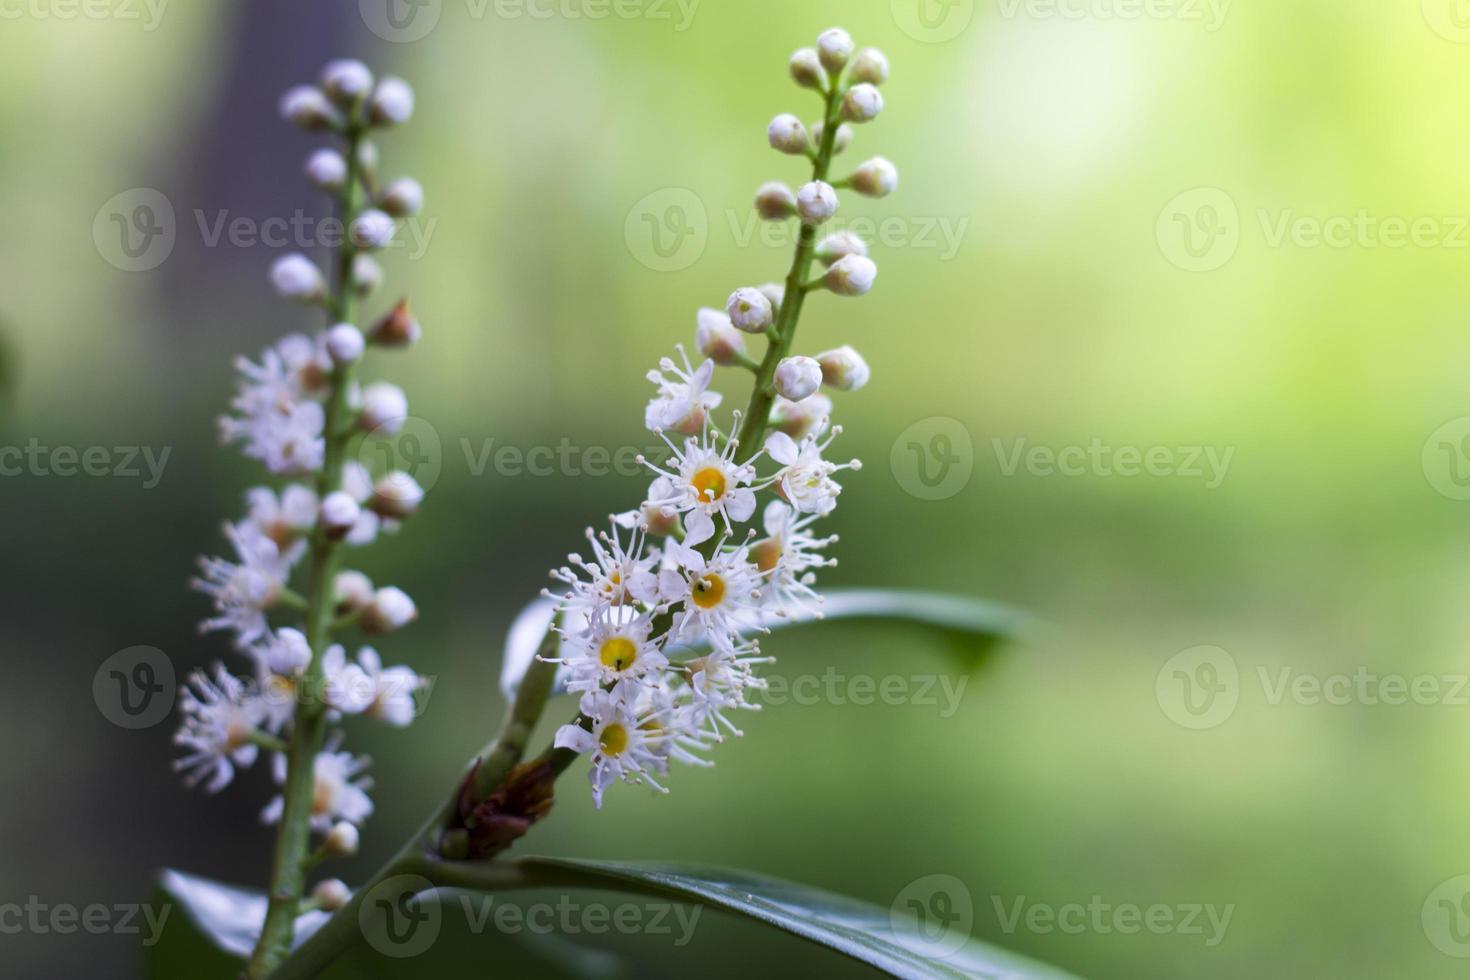 kirschlorbeer beginnt zu blühe- cherry laurier begint te bloeien foto